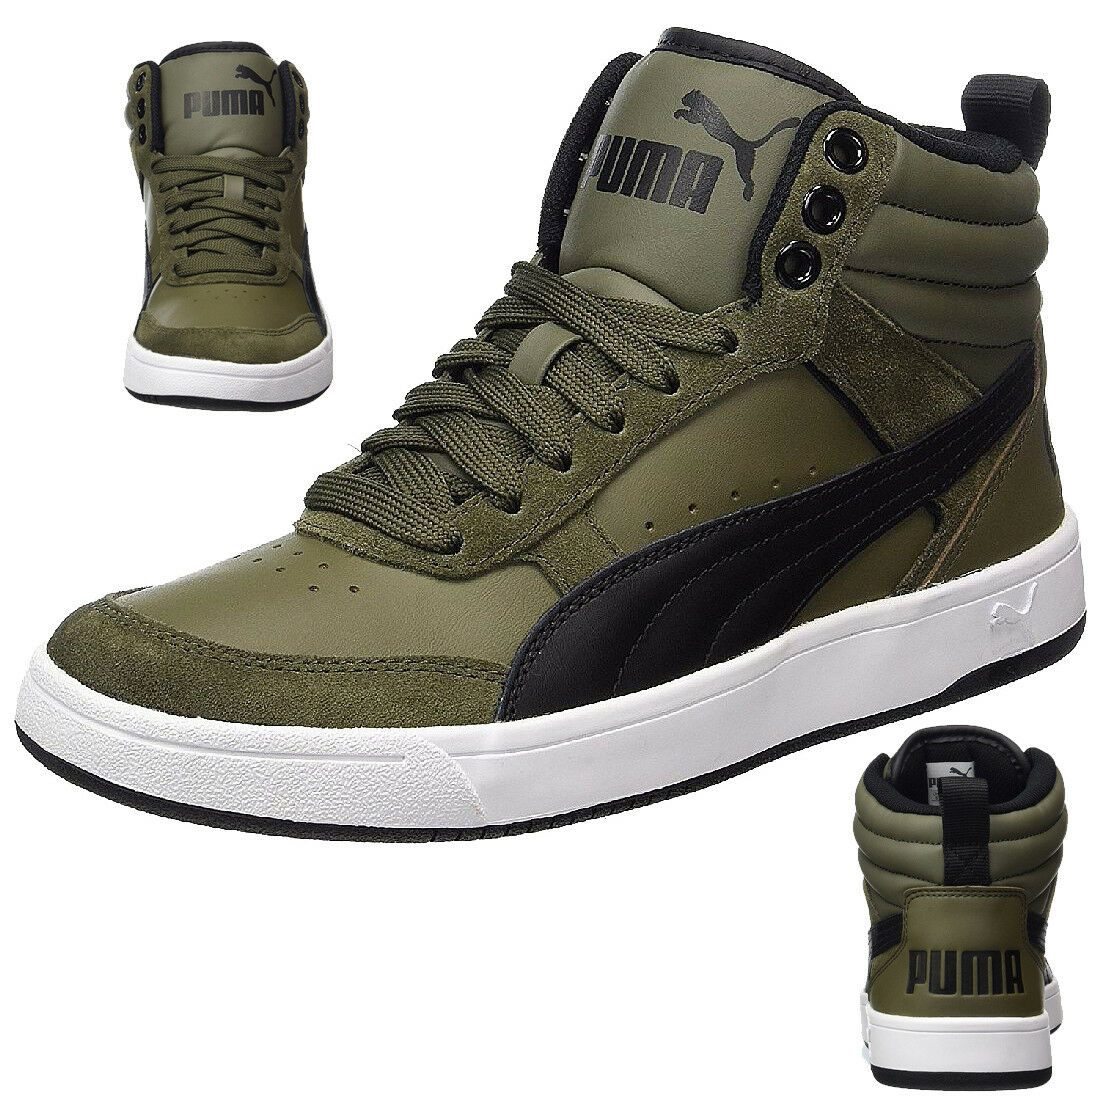 Puma Herren Rebound Street V2 Sneaker Herren Puma Zapatos olive 363715 04 af3c7e